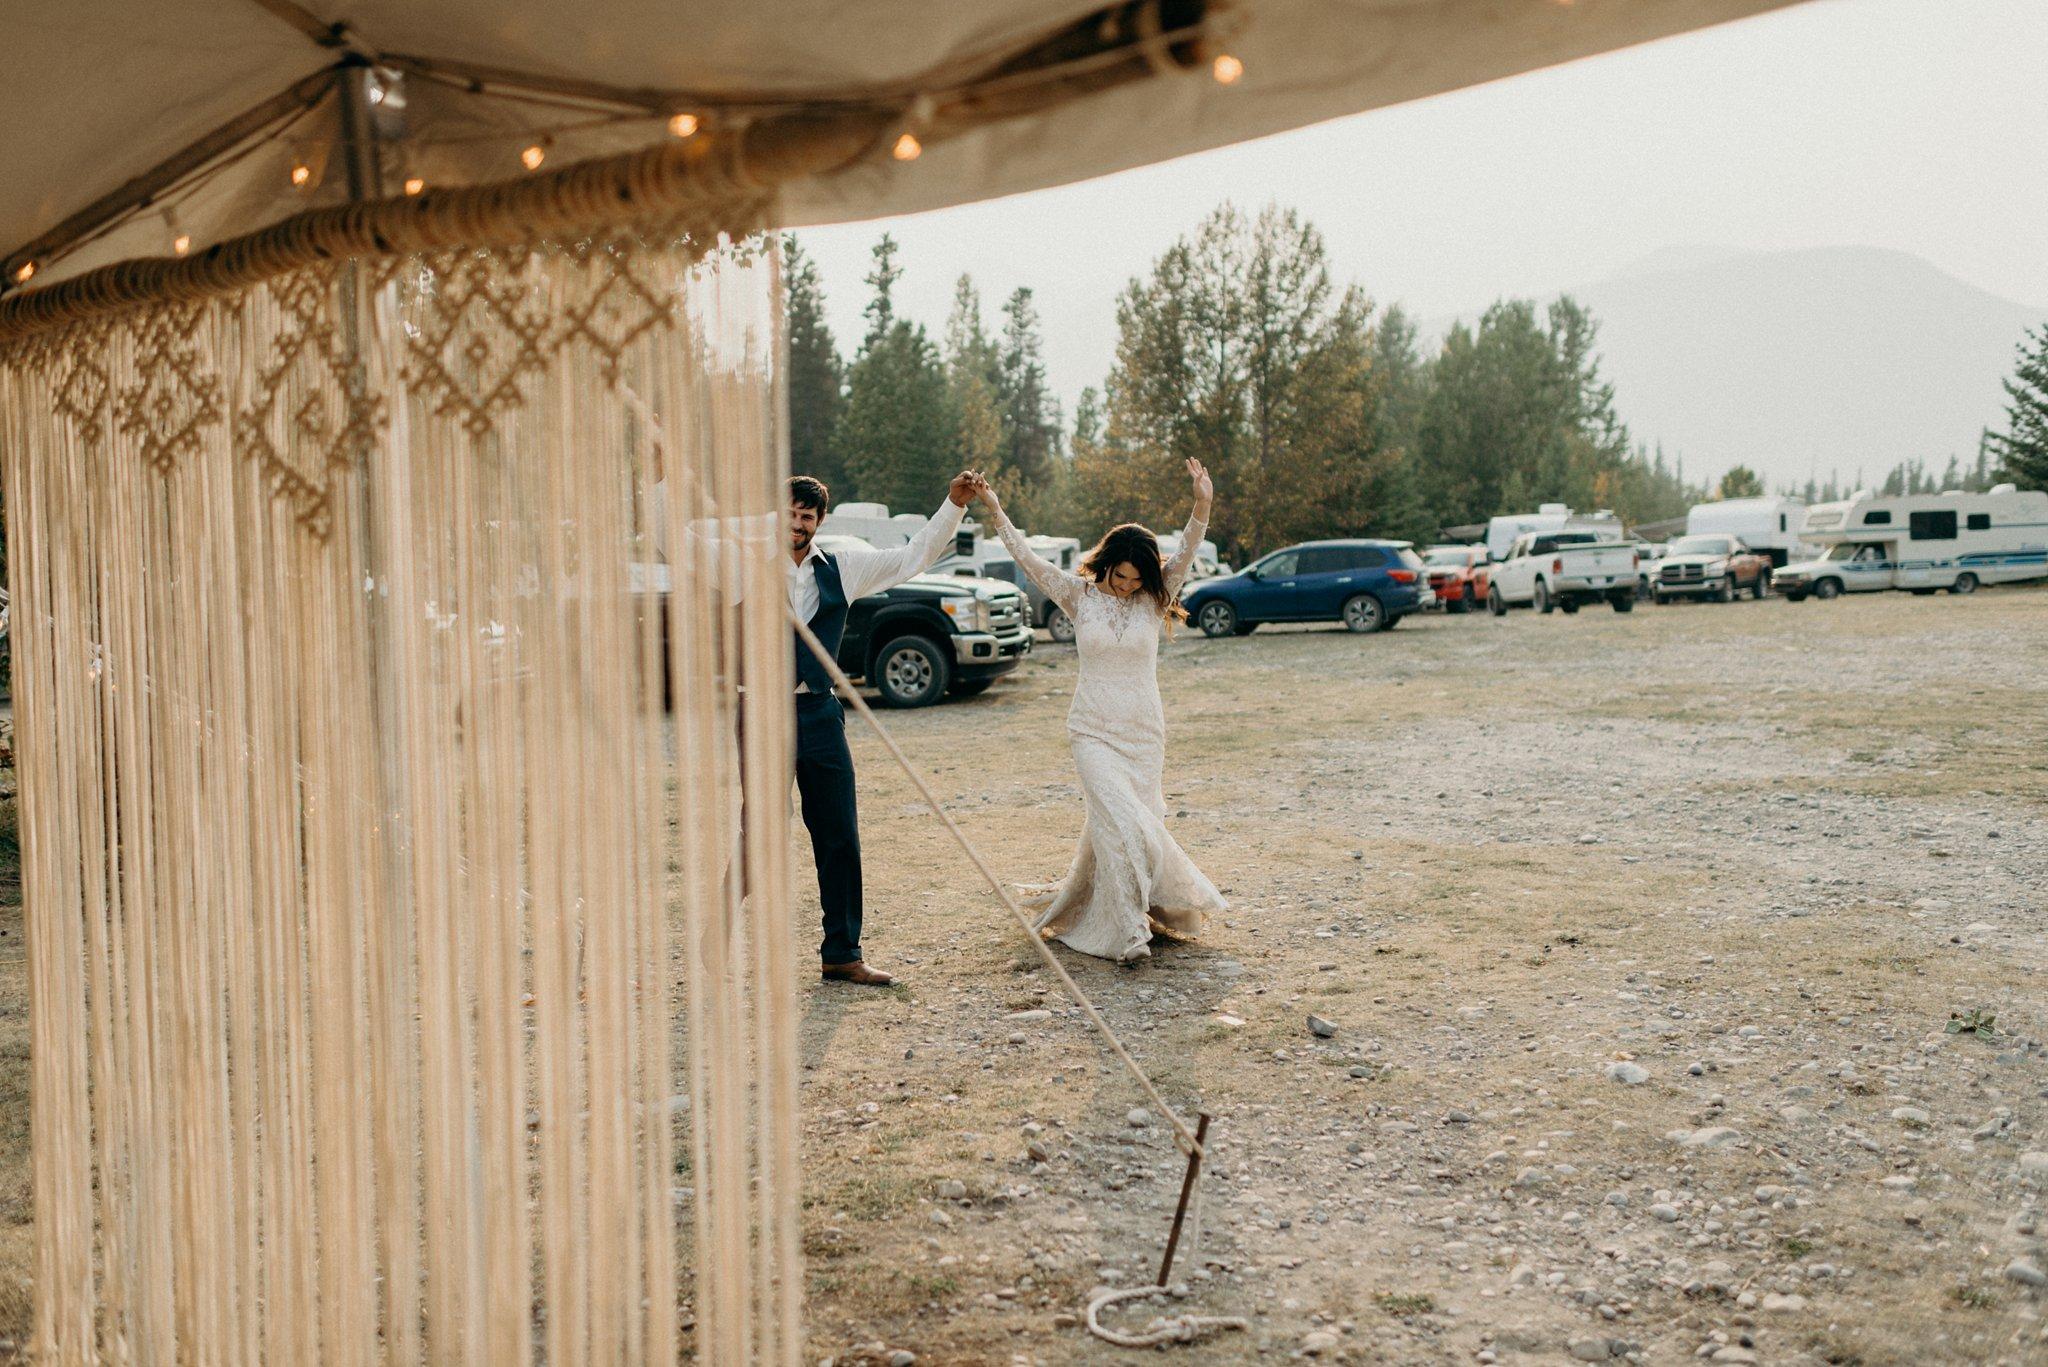 kaihla_tonai_intimate_wedding_elopement_photographer_6770.jpg